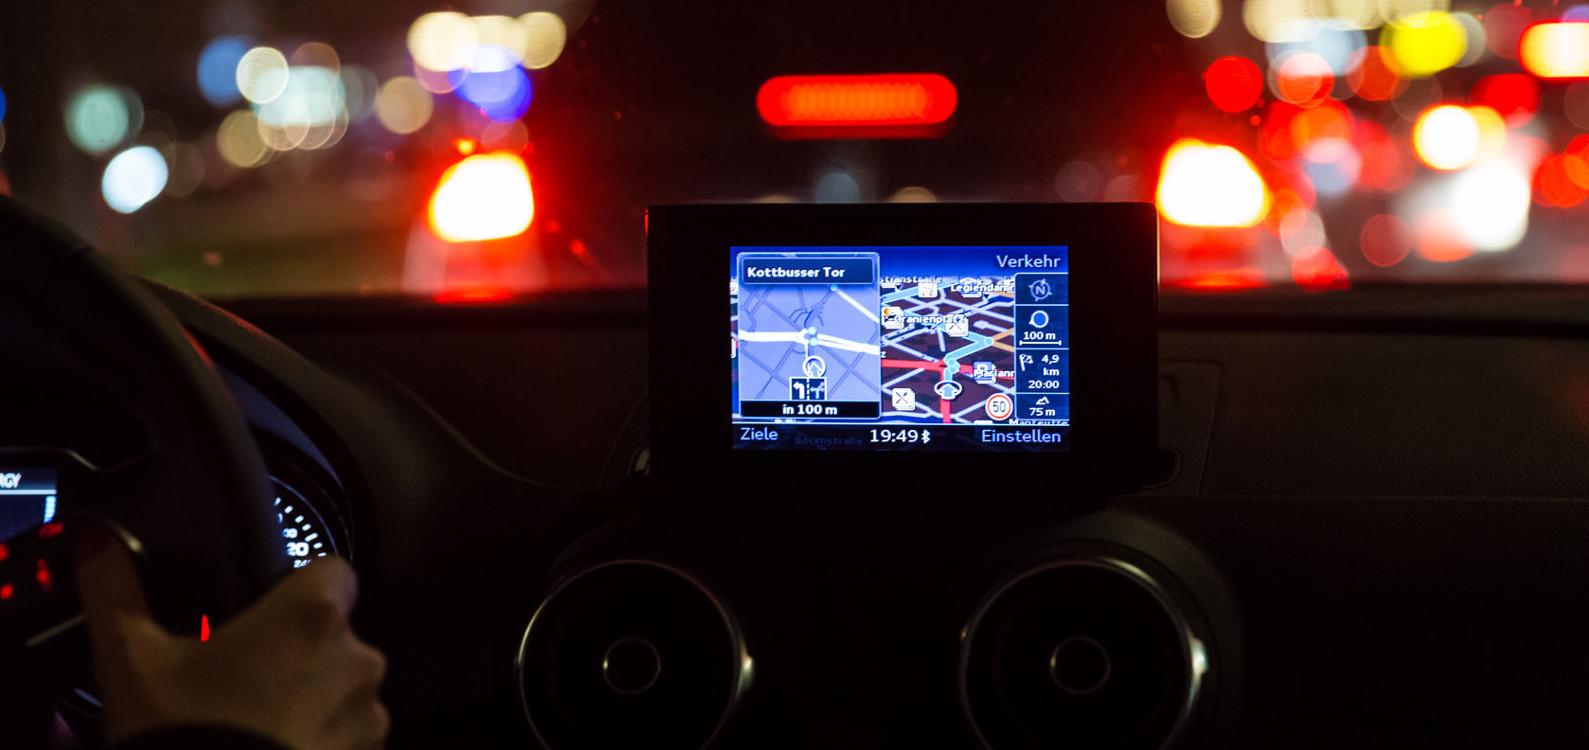 private investigator vehicle tracking